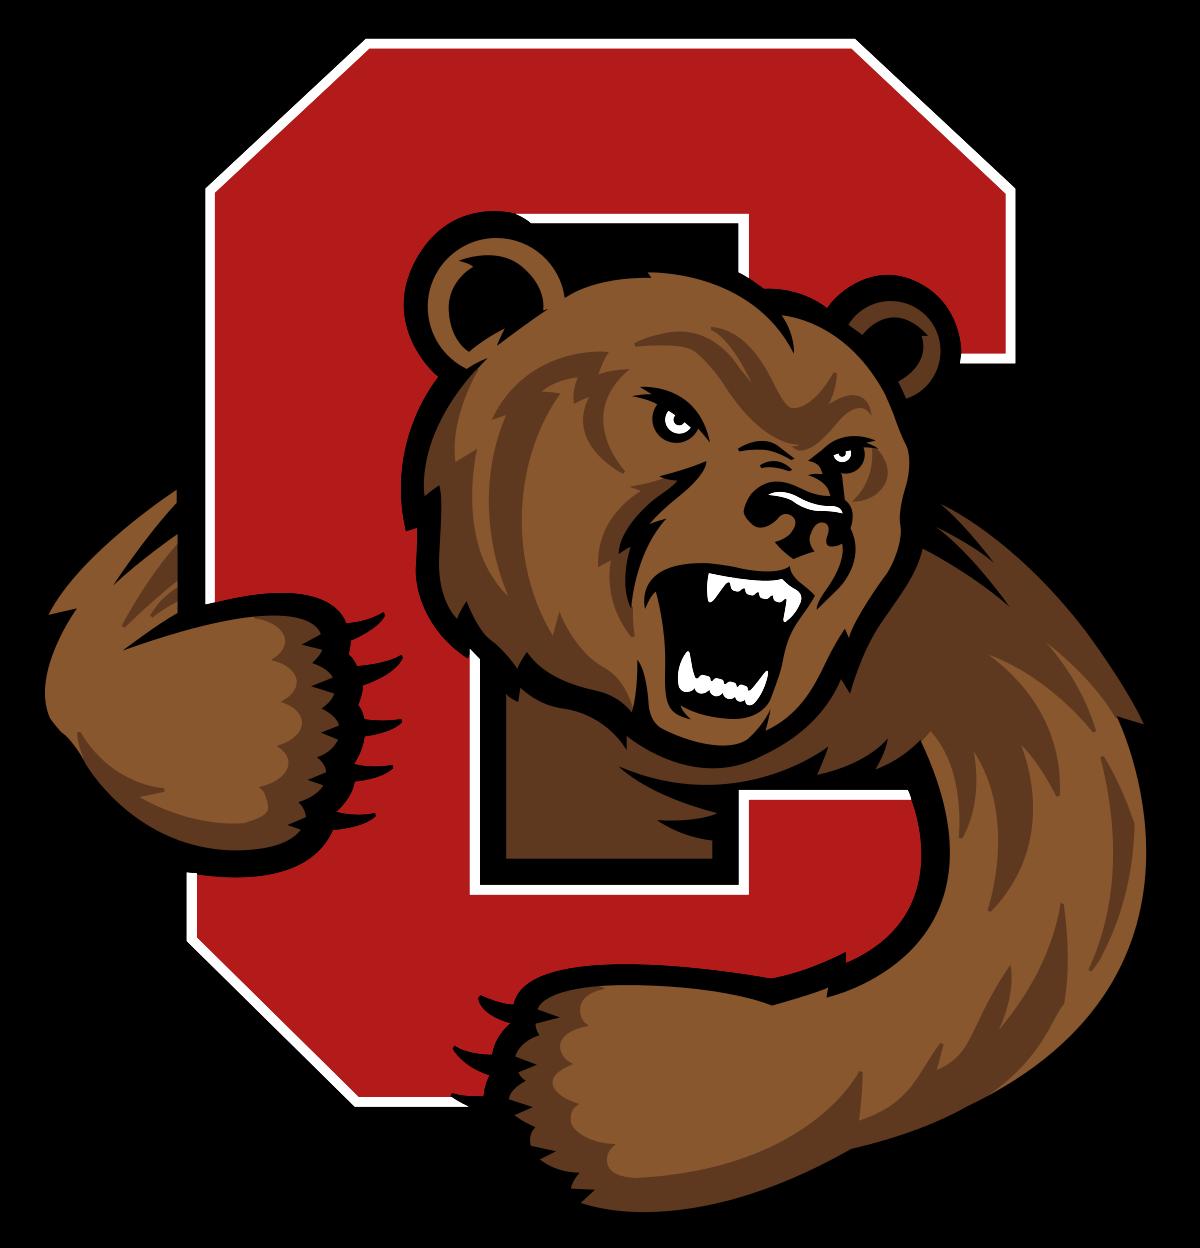 Cornell big red wikipedia. Groundhog clipart underground animal